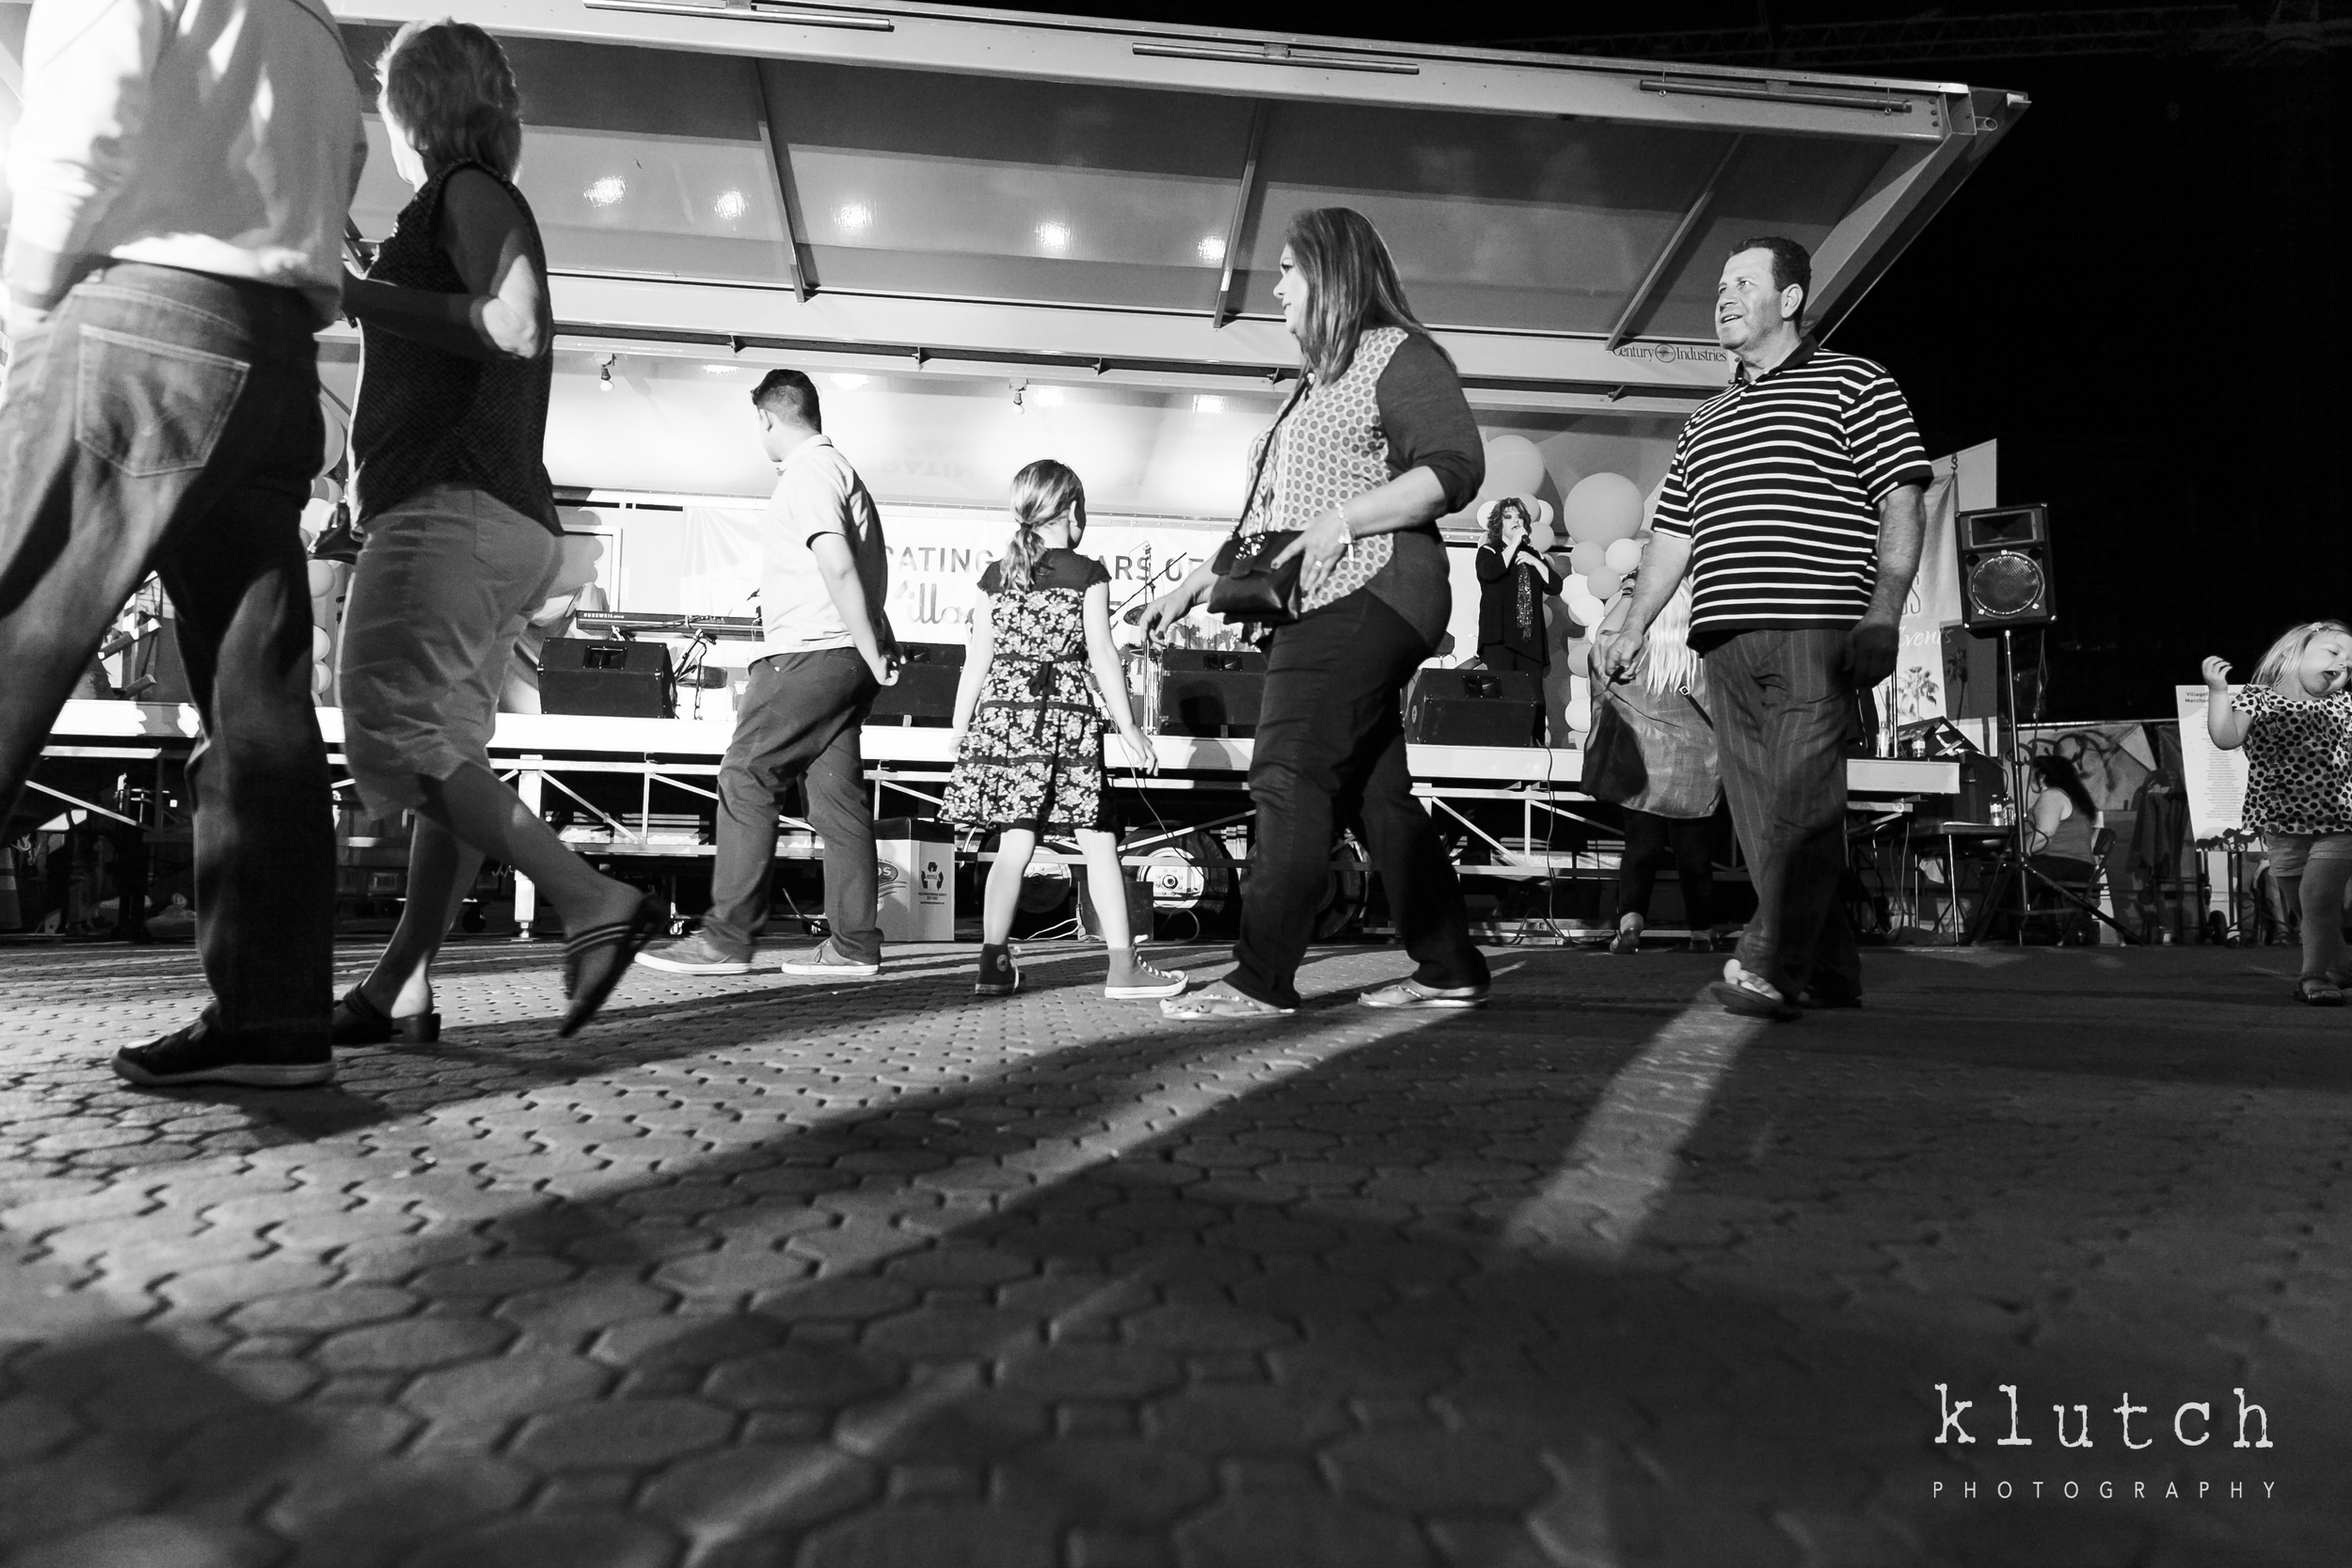 Klutch Photography,white rock family photographer, vancouver family photographer, whiterock lifestyle photographer, life unscripted photographer, life unscripted session, photography,Dina Ferreira Stoddard-34.jpg